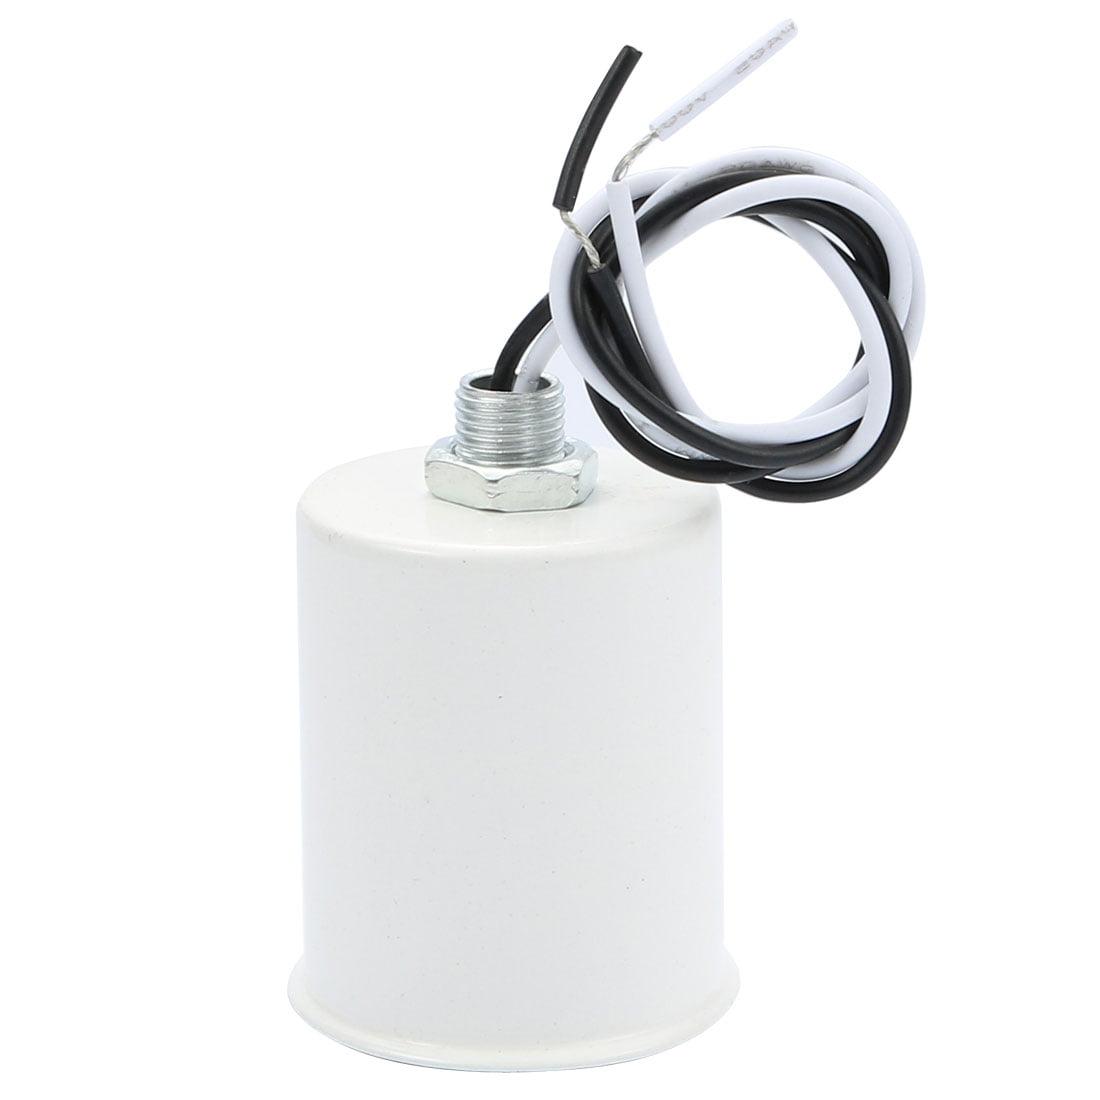 Unique Bargains E27 Ceramic Screw Base Round Light Bulb Lamp Socket Lampholder Adapter White - image 3 of 3